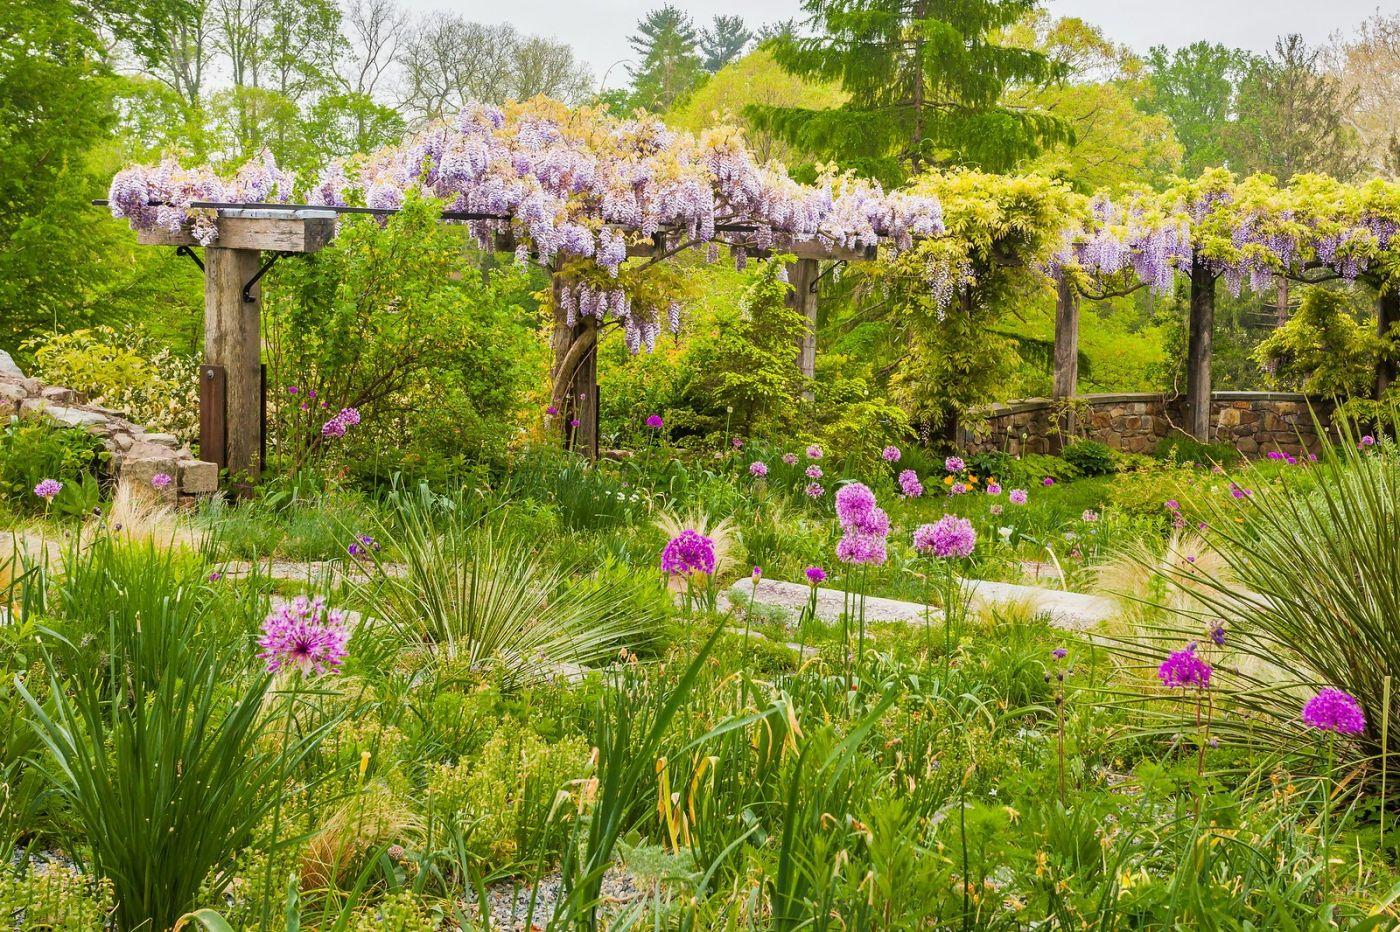 Chanticleer花园,那年盛开的紫藤花_图1-20